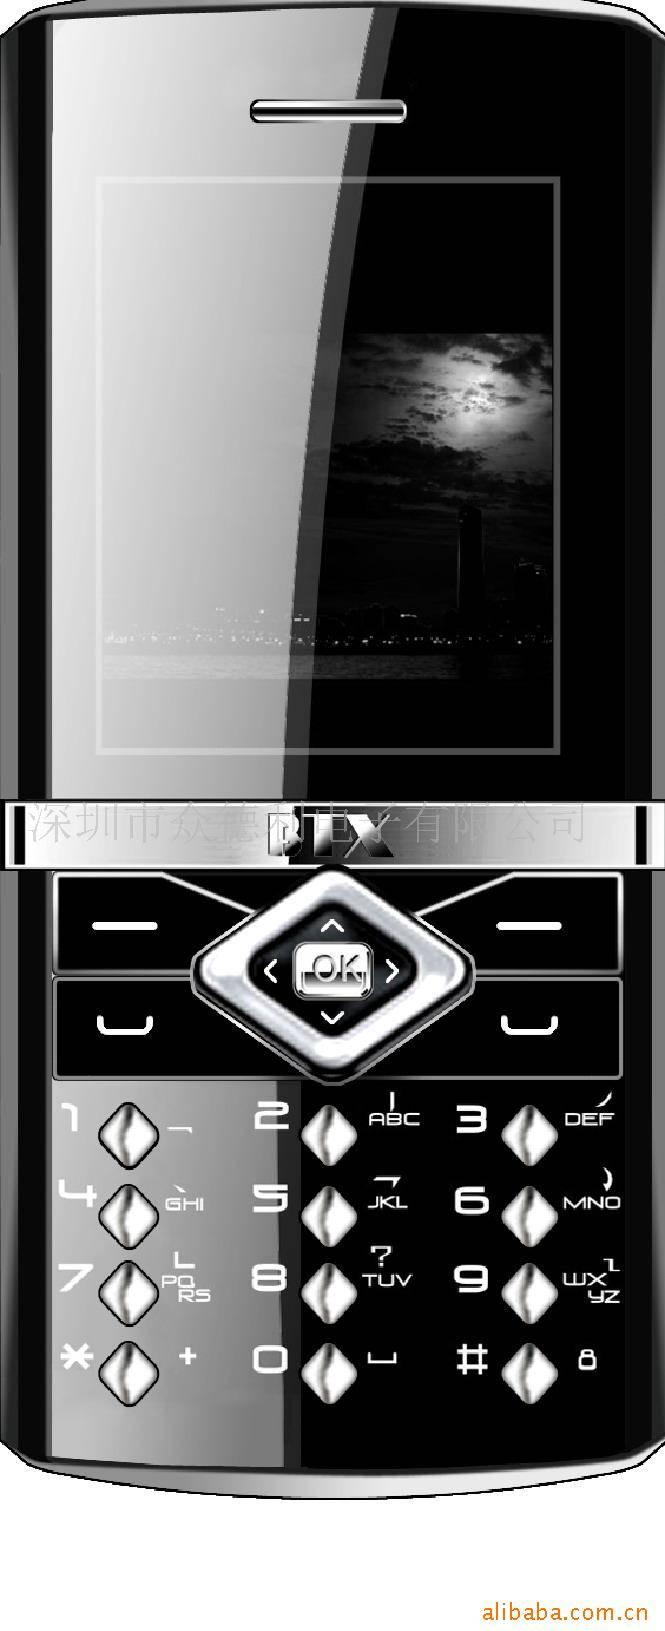 sell CDMA 450 MHZ mobile phone